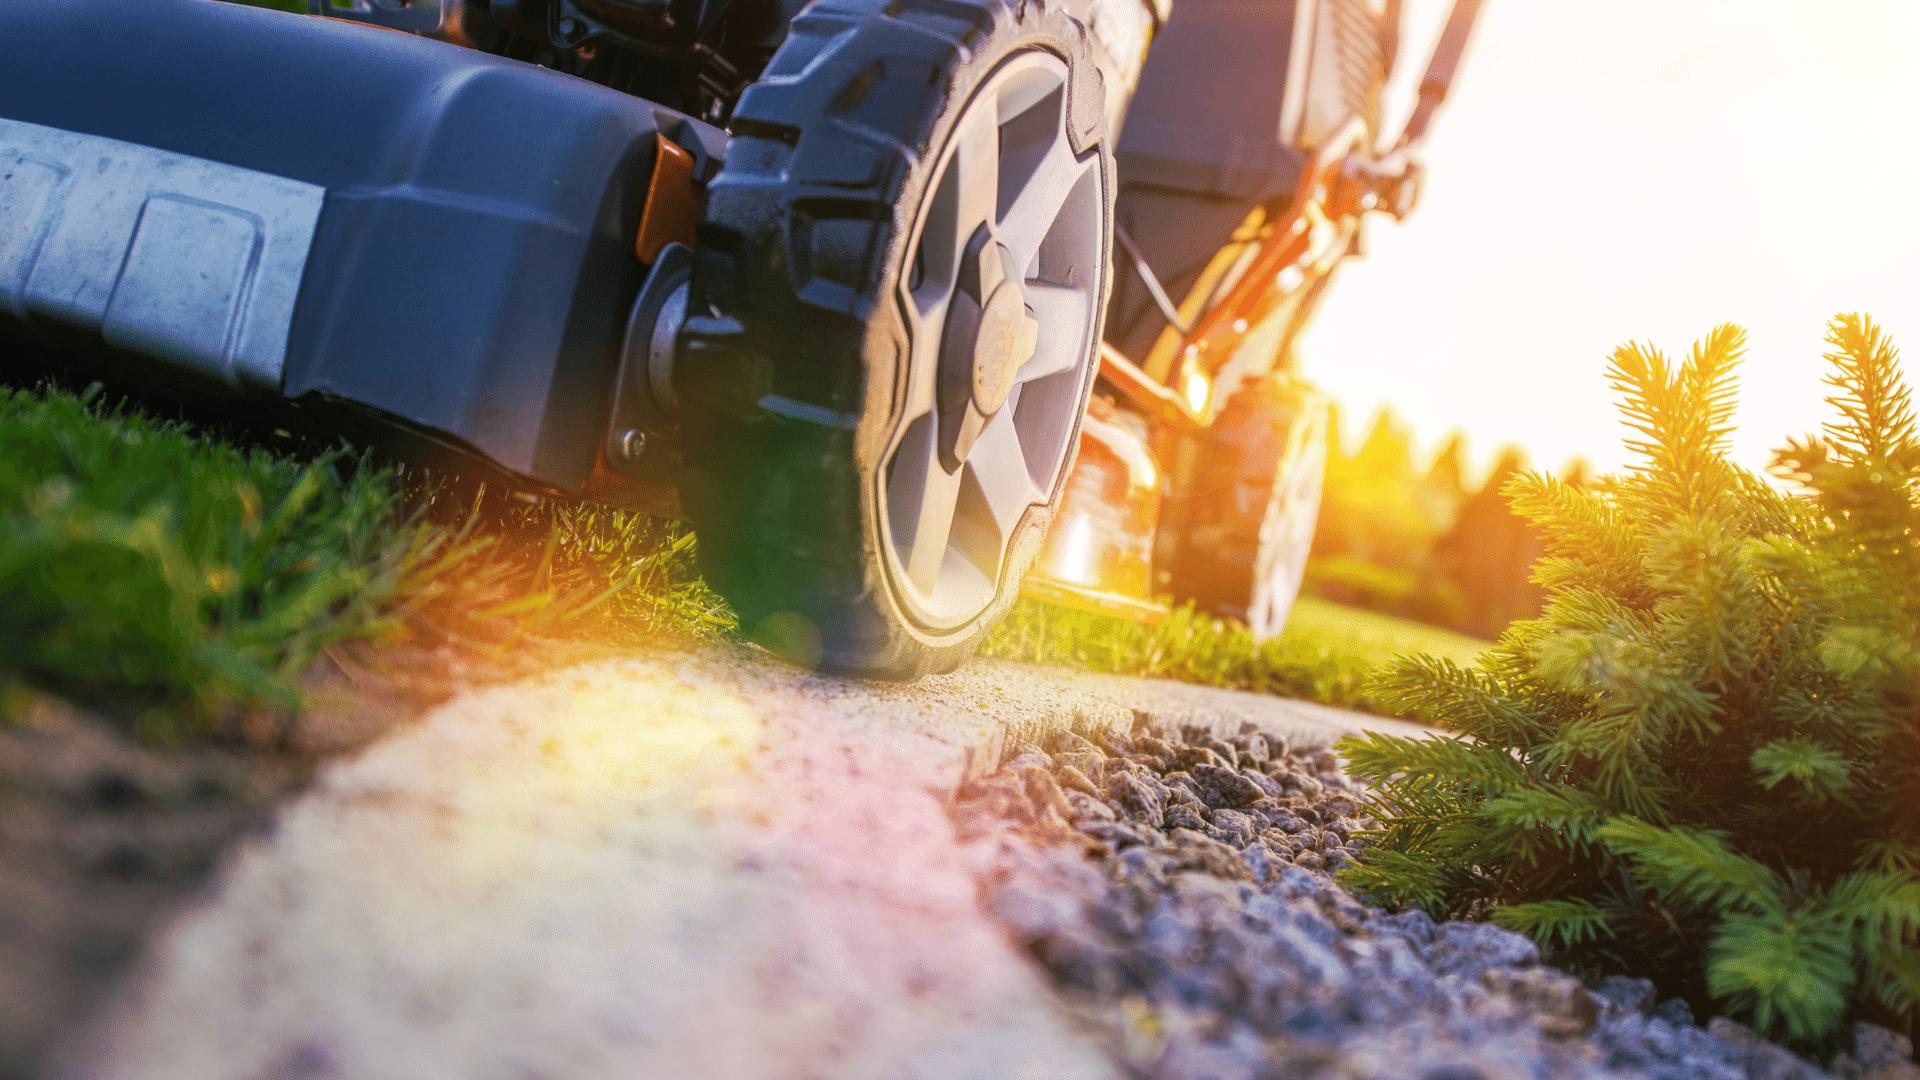 Closeup of lawnmower cutting grass around landscaping